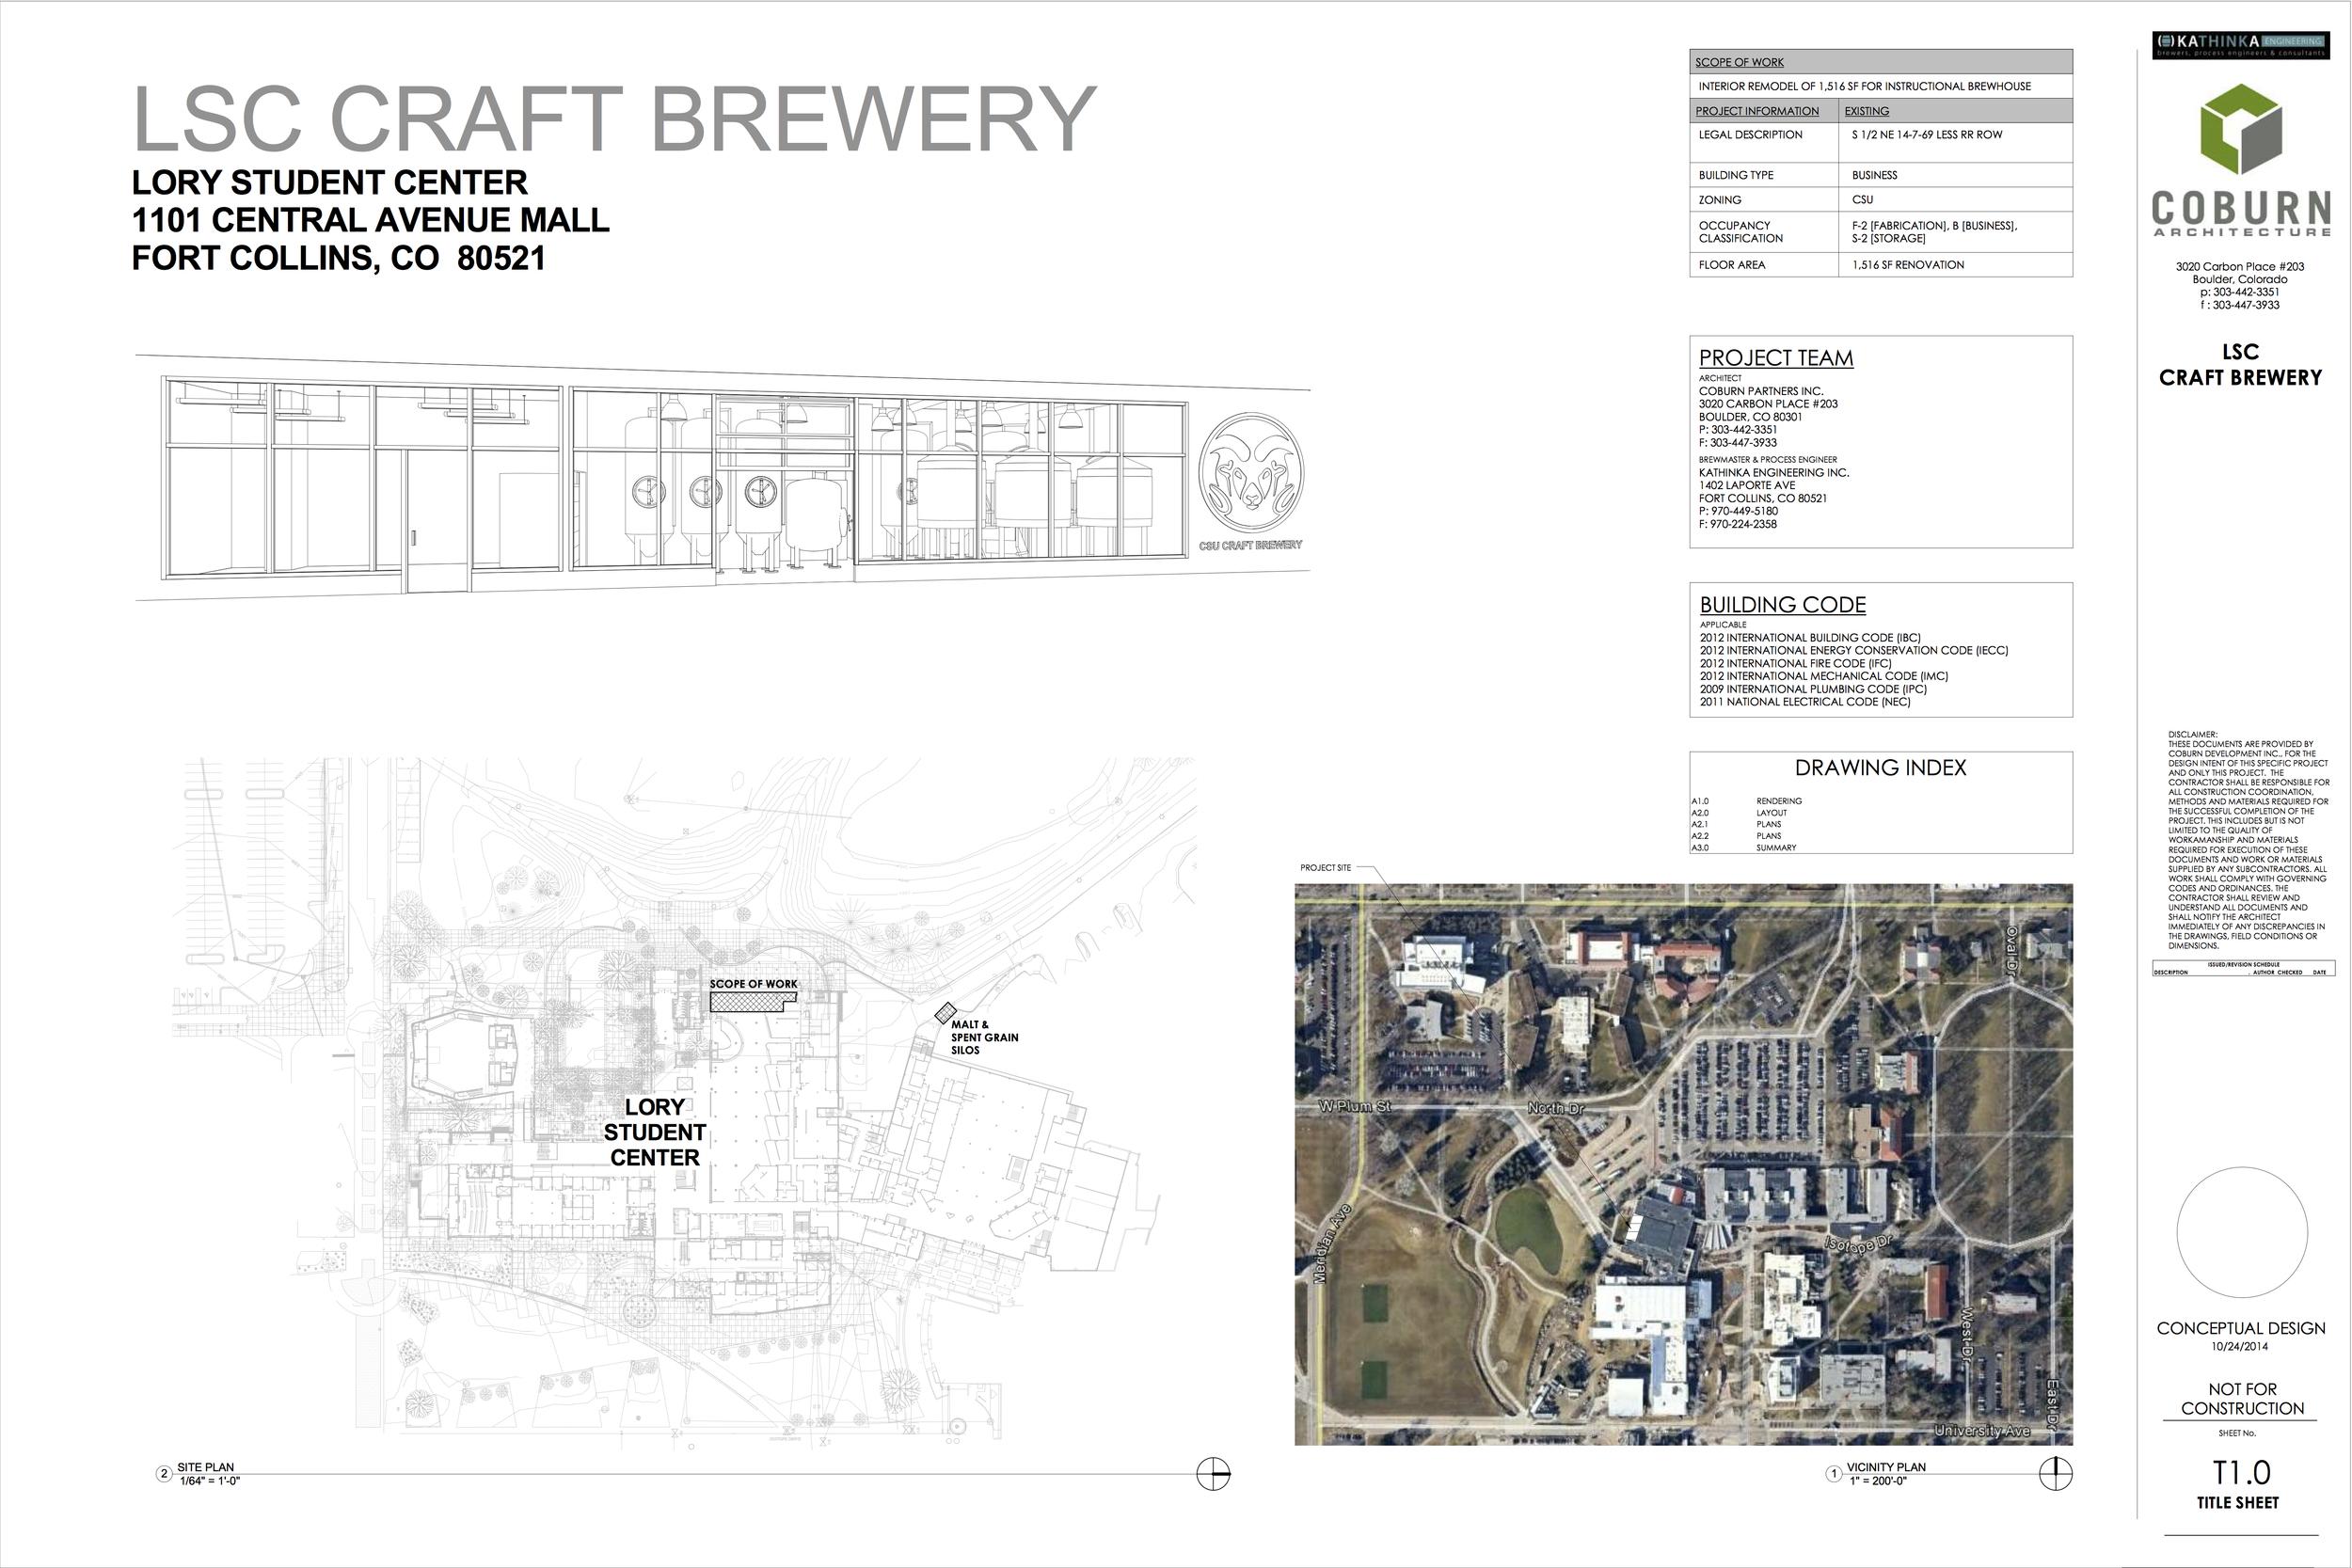 2014 1024_CSU Brewhouse copy2.jpg